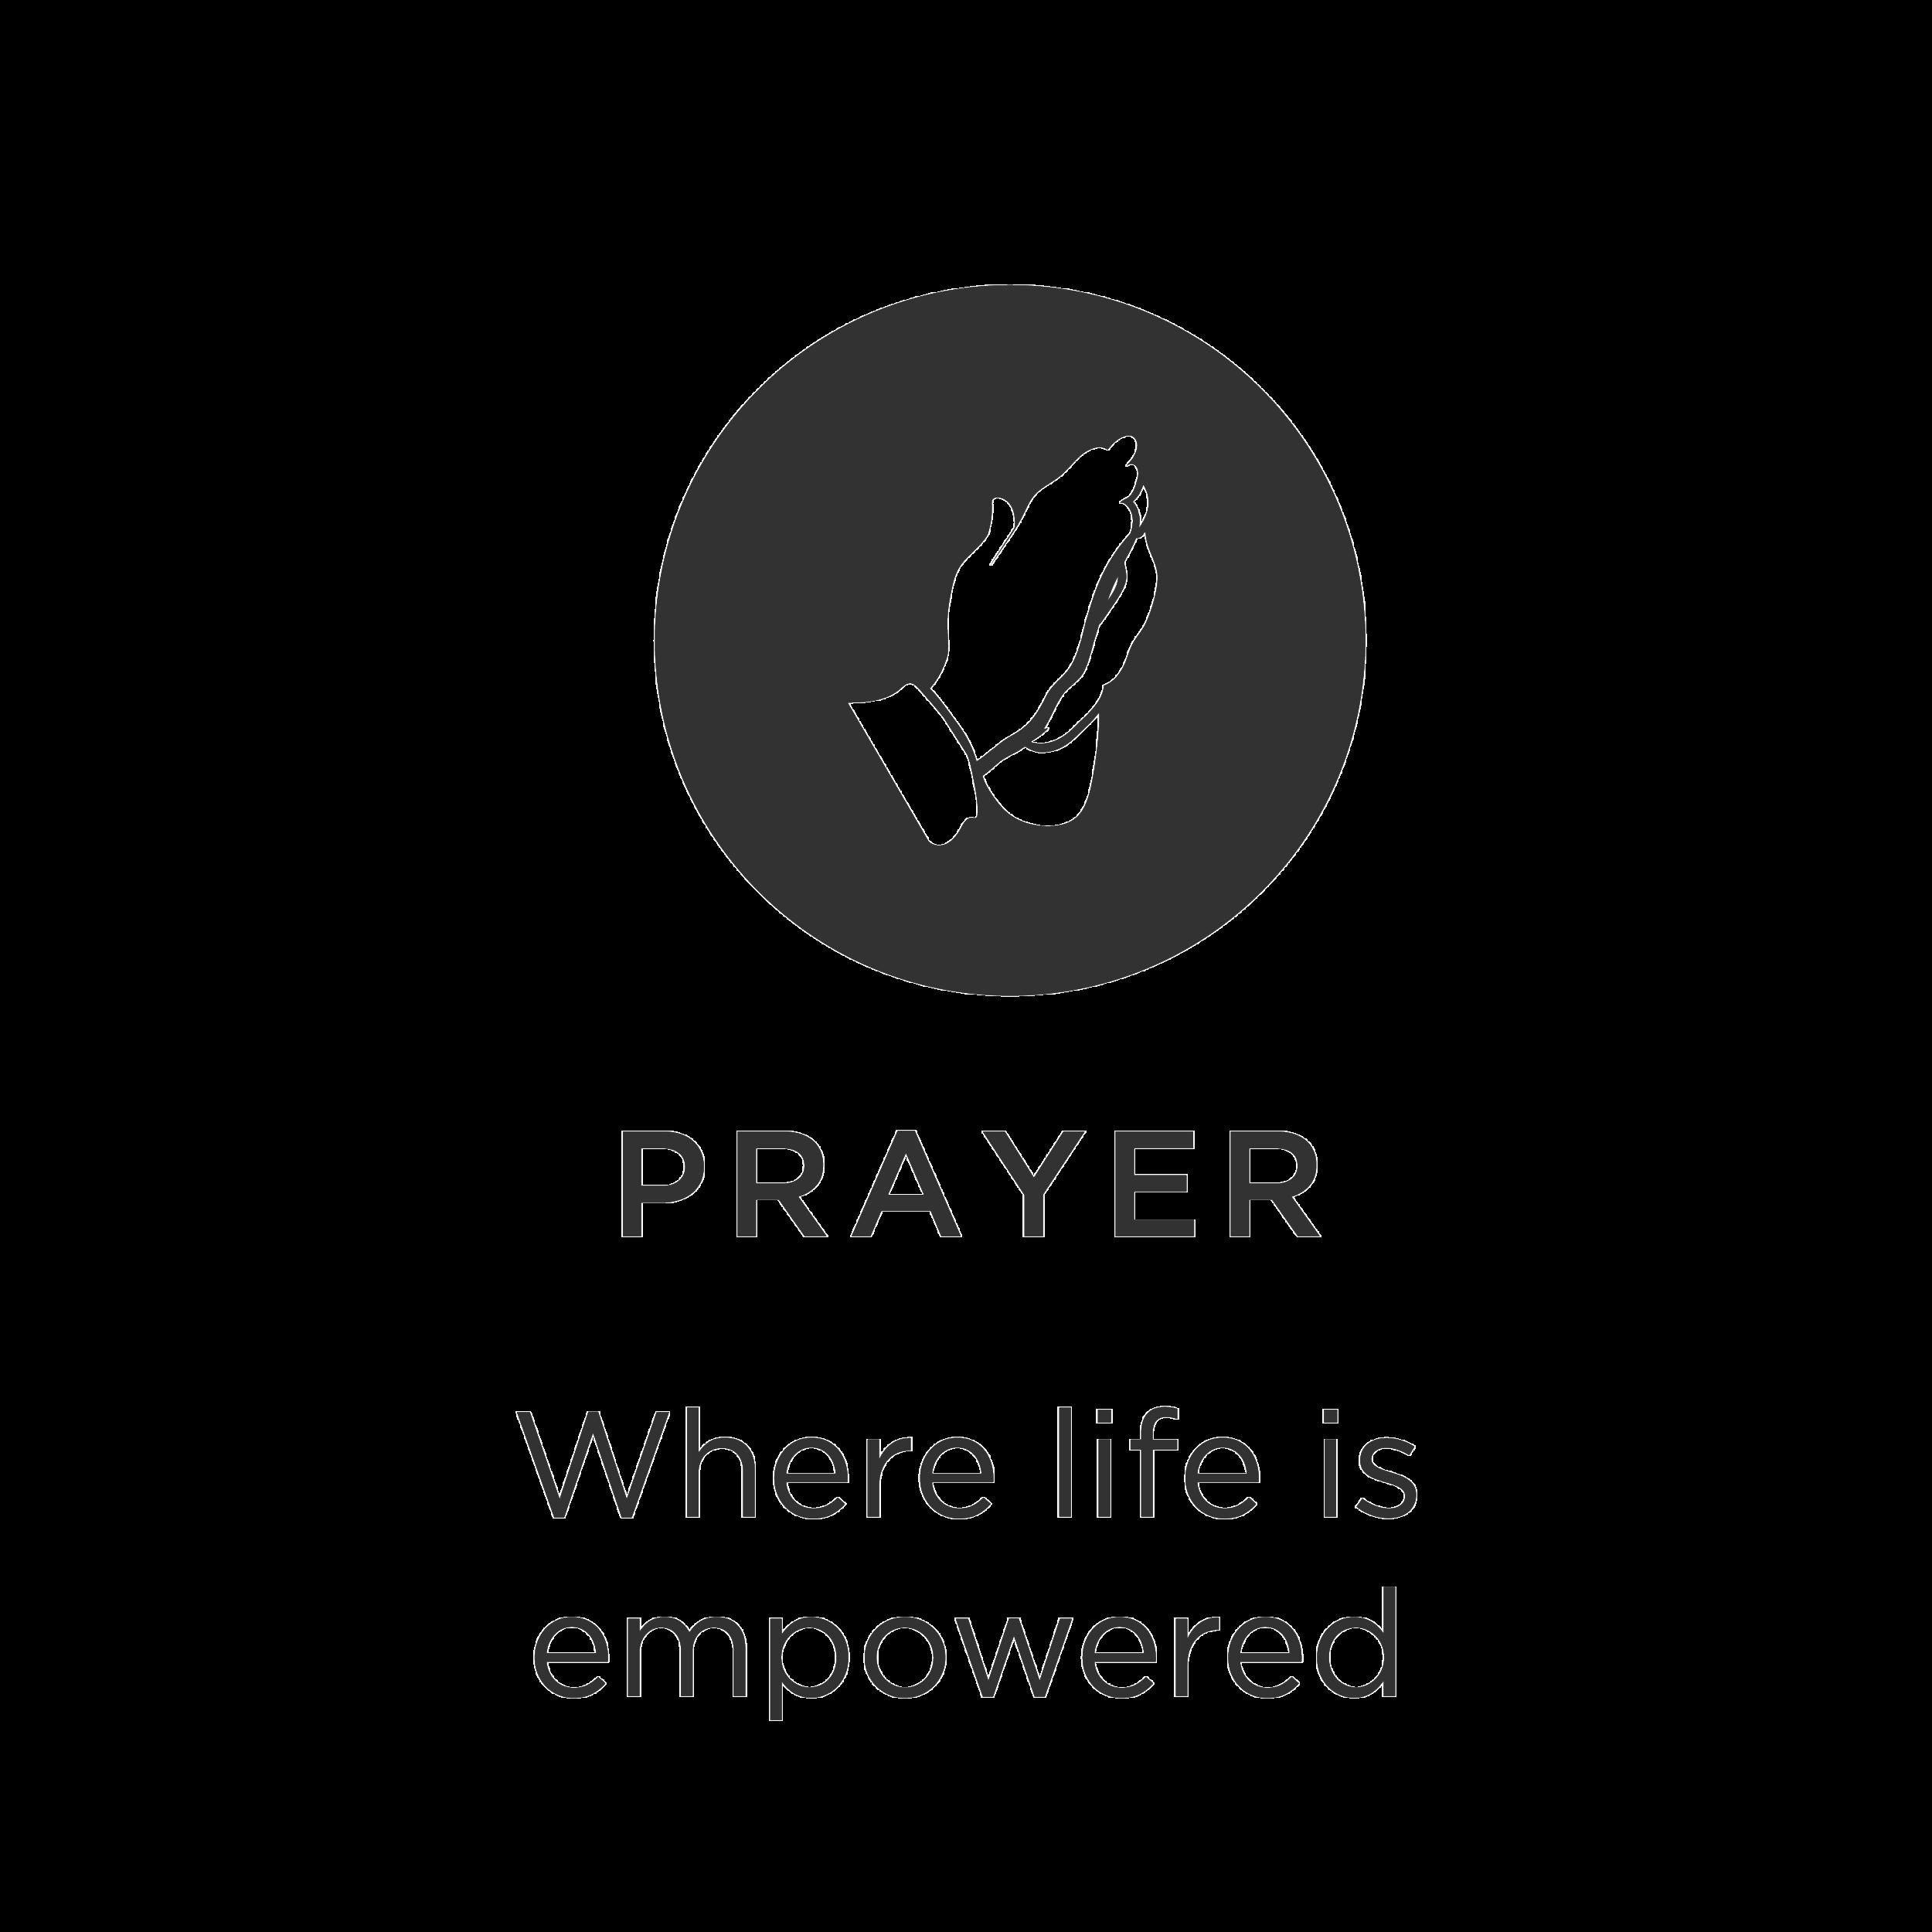 Prayer-01.png